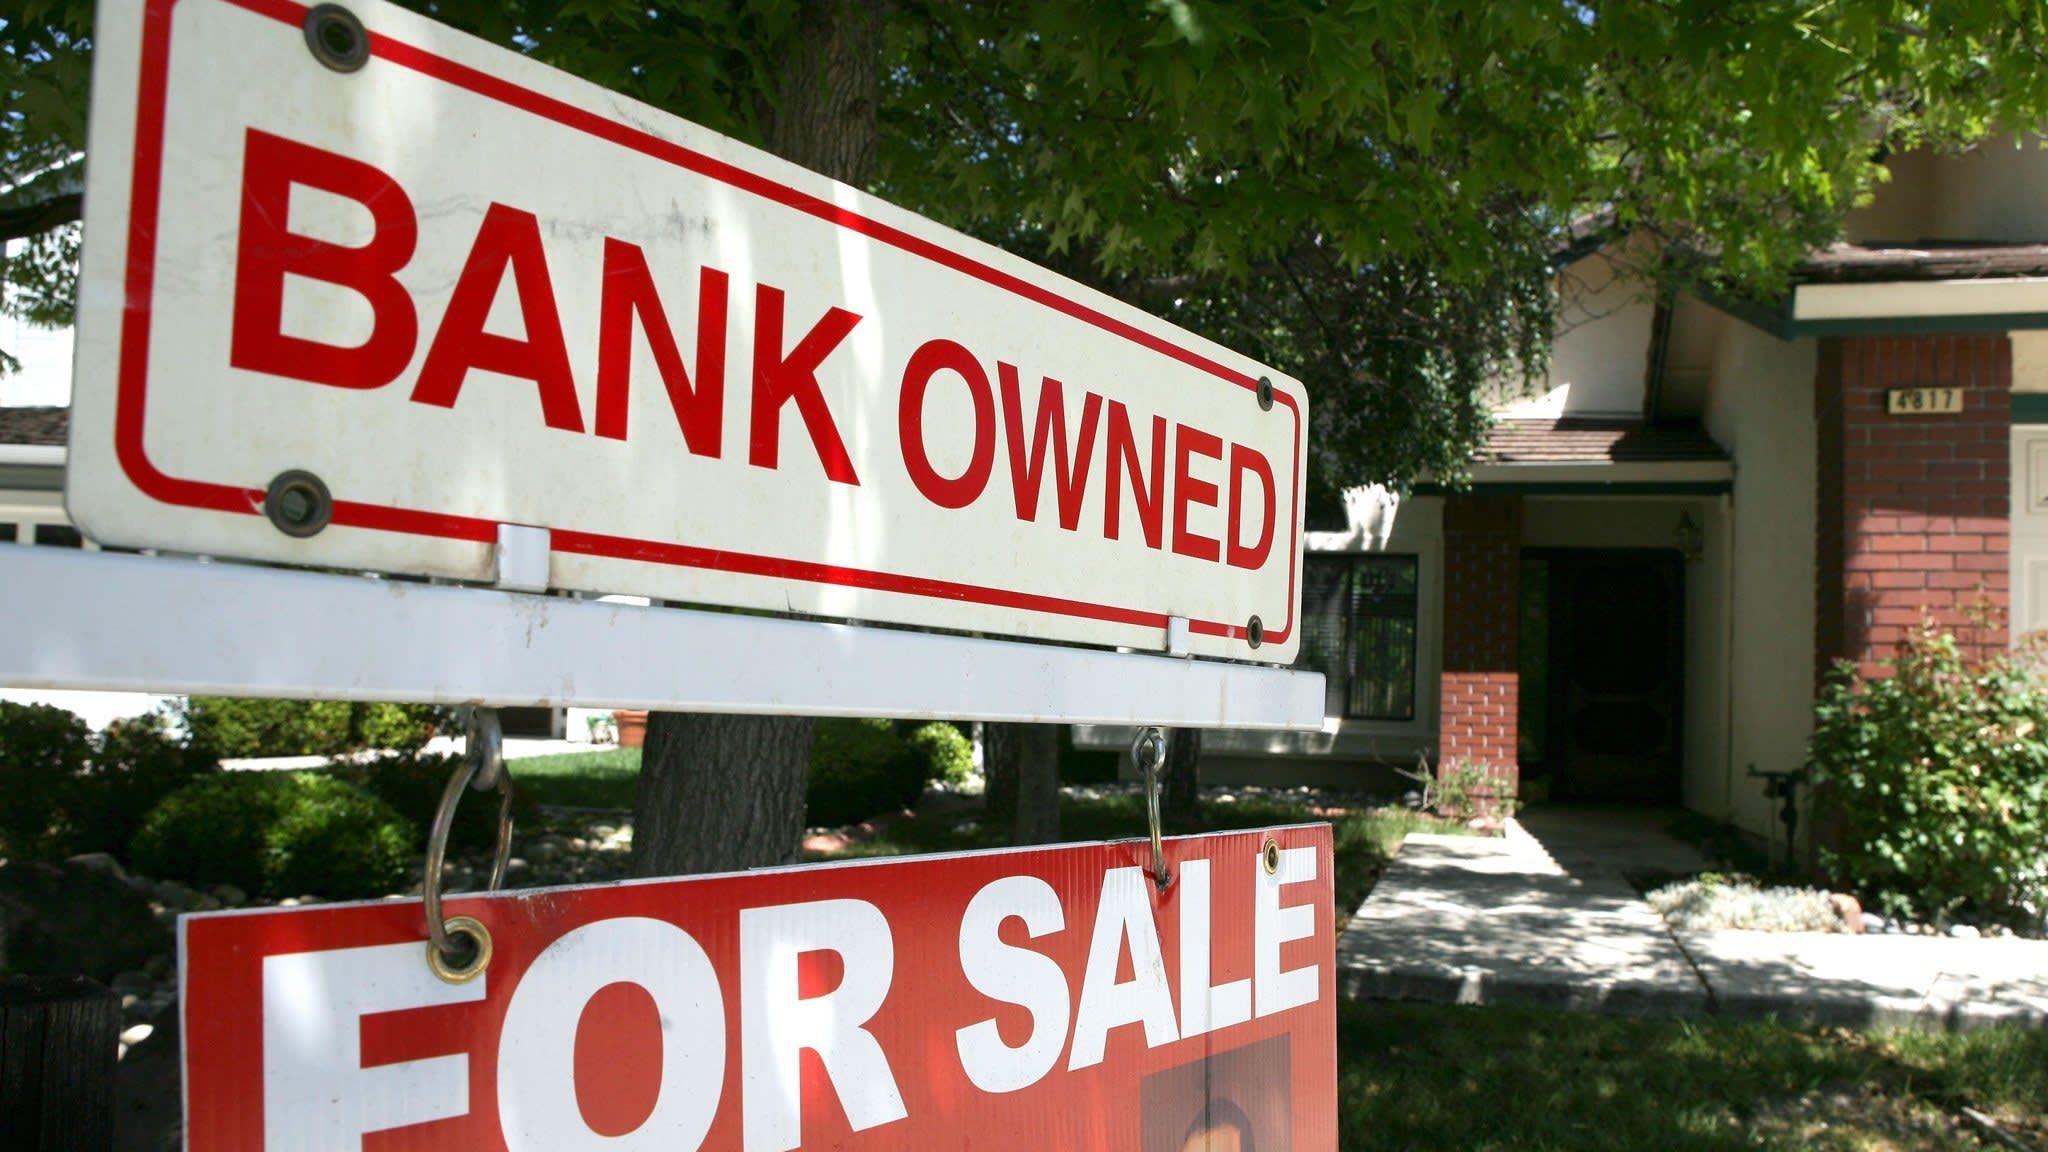 Pimco and BlackRock accused of subprime 'profit gouging'